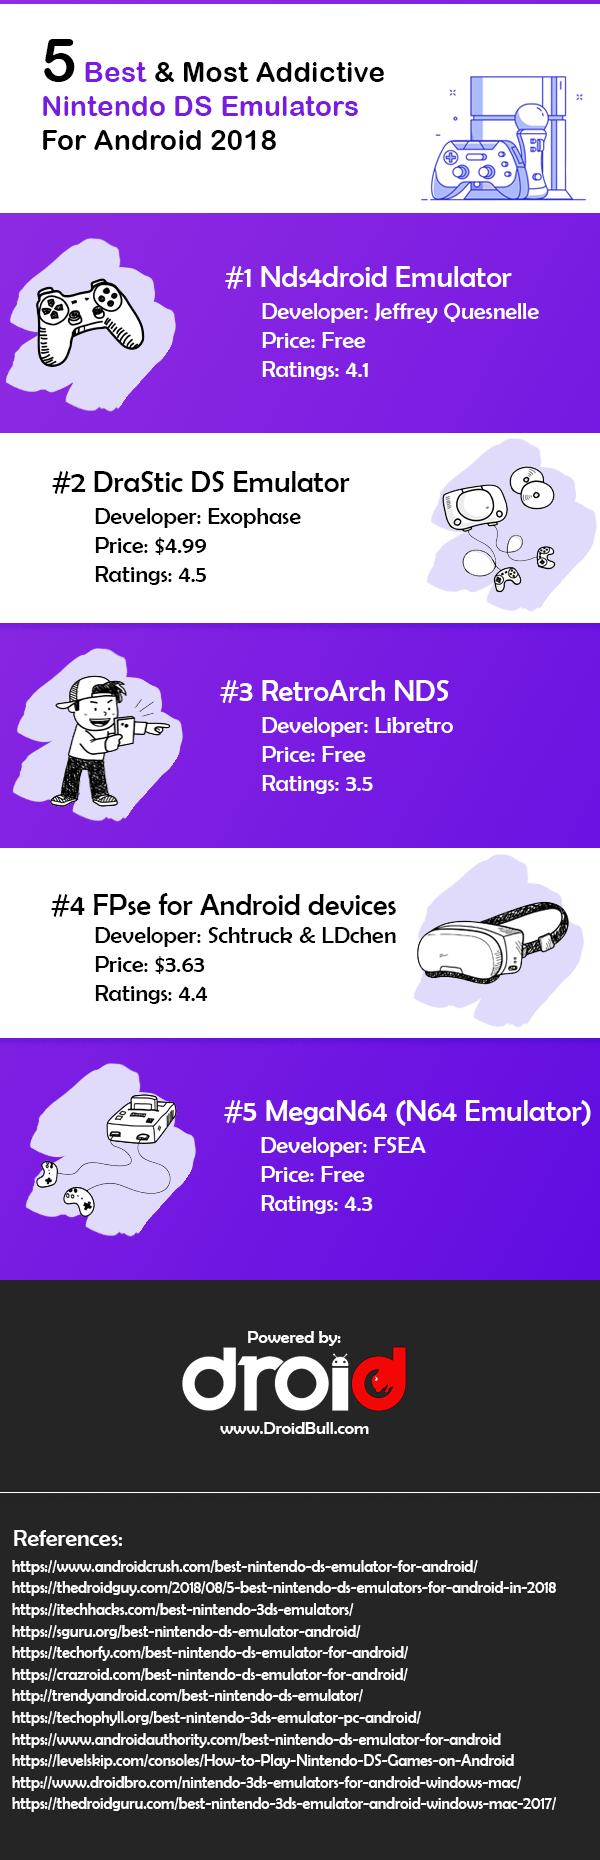 fpse para android apk 2018